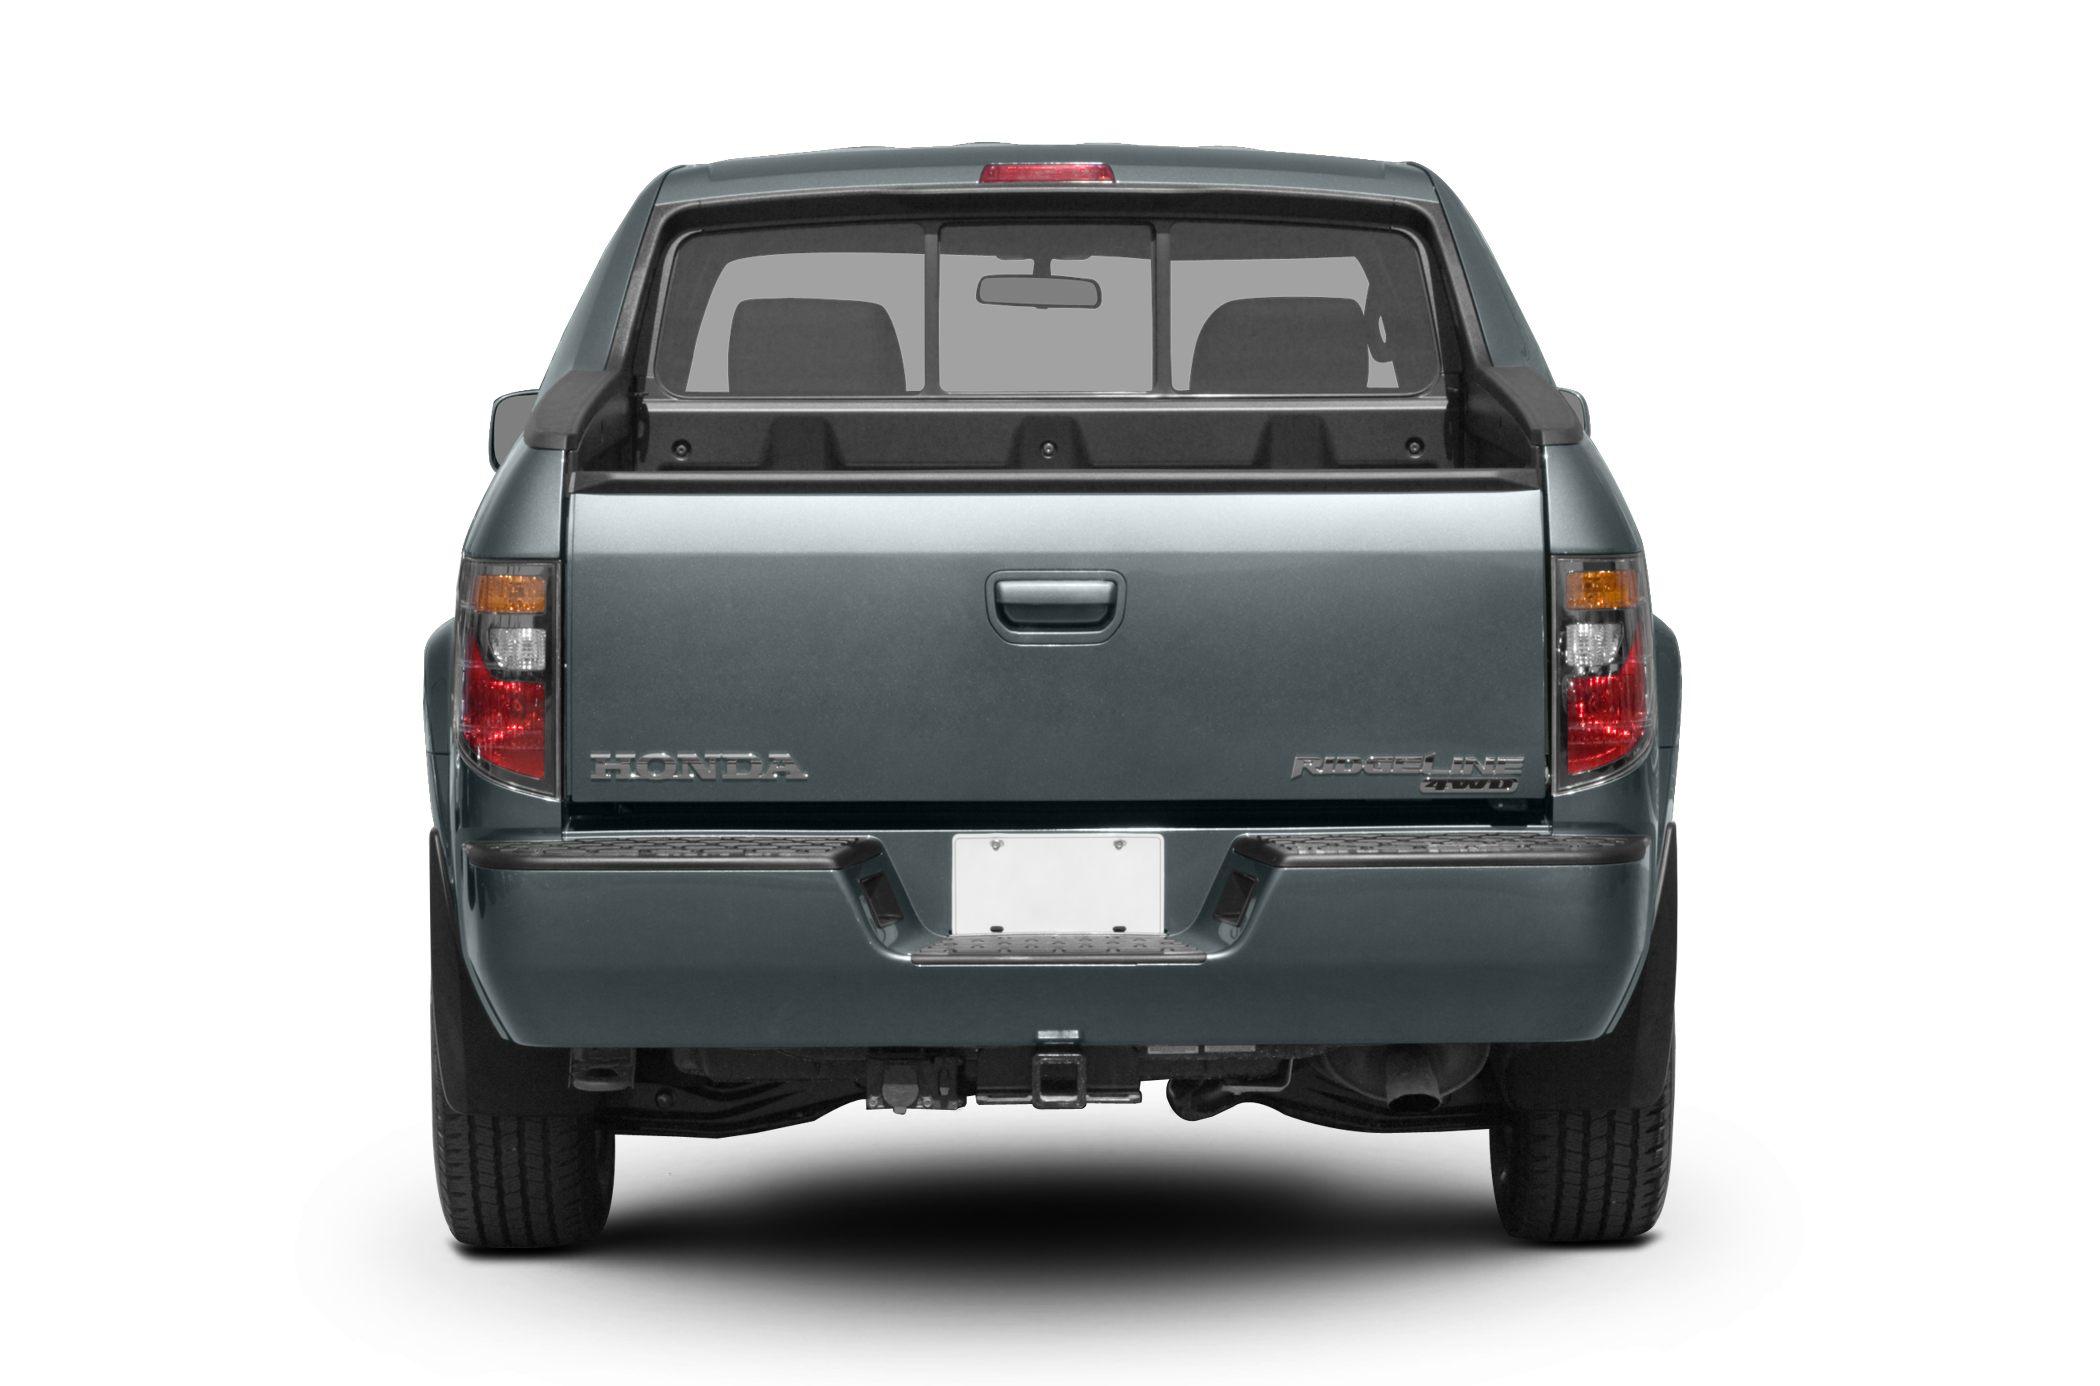 2008 honda ridgeline styles amp features highlights